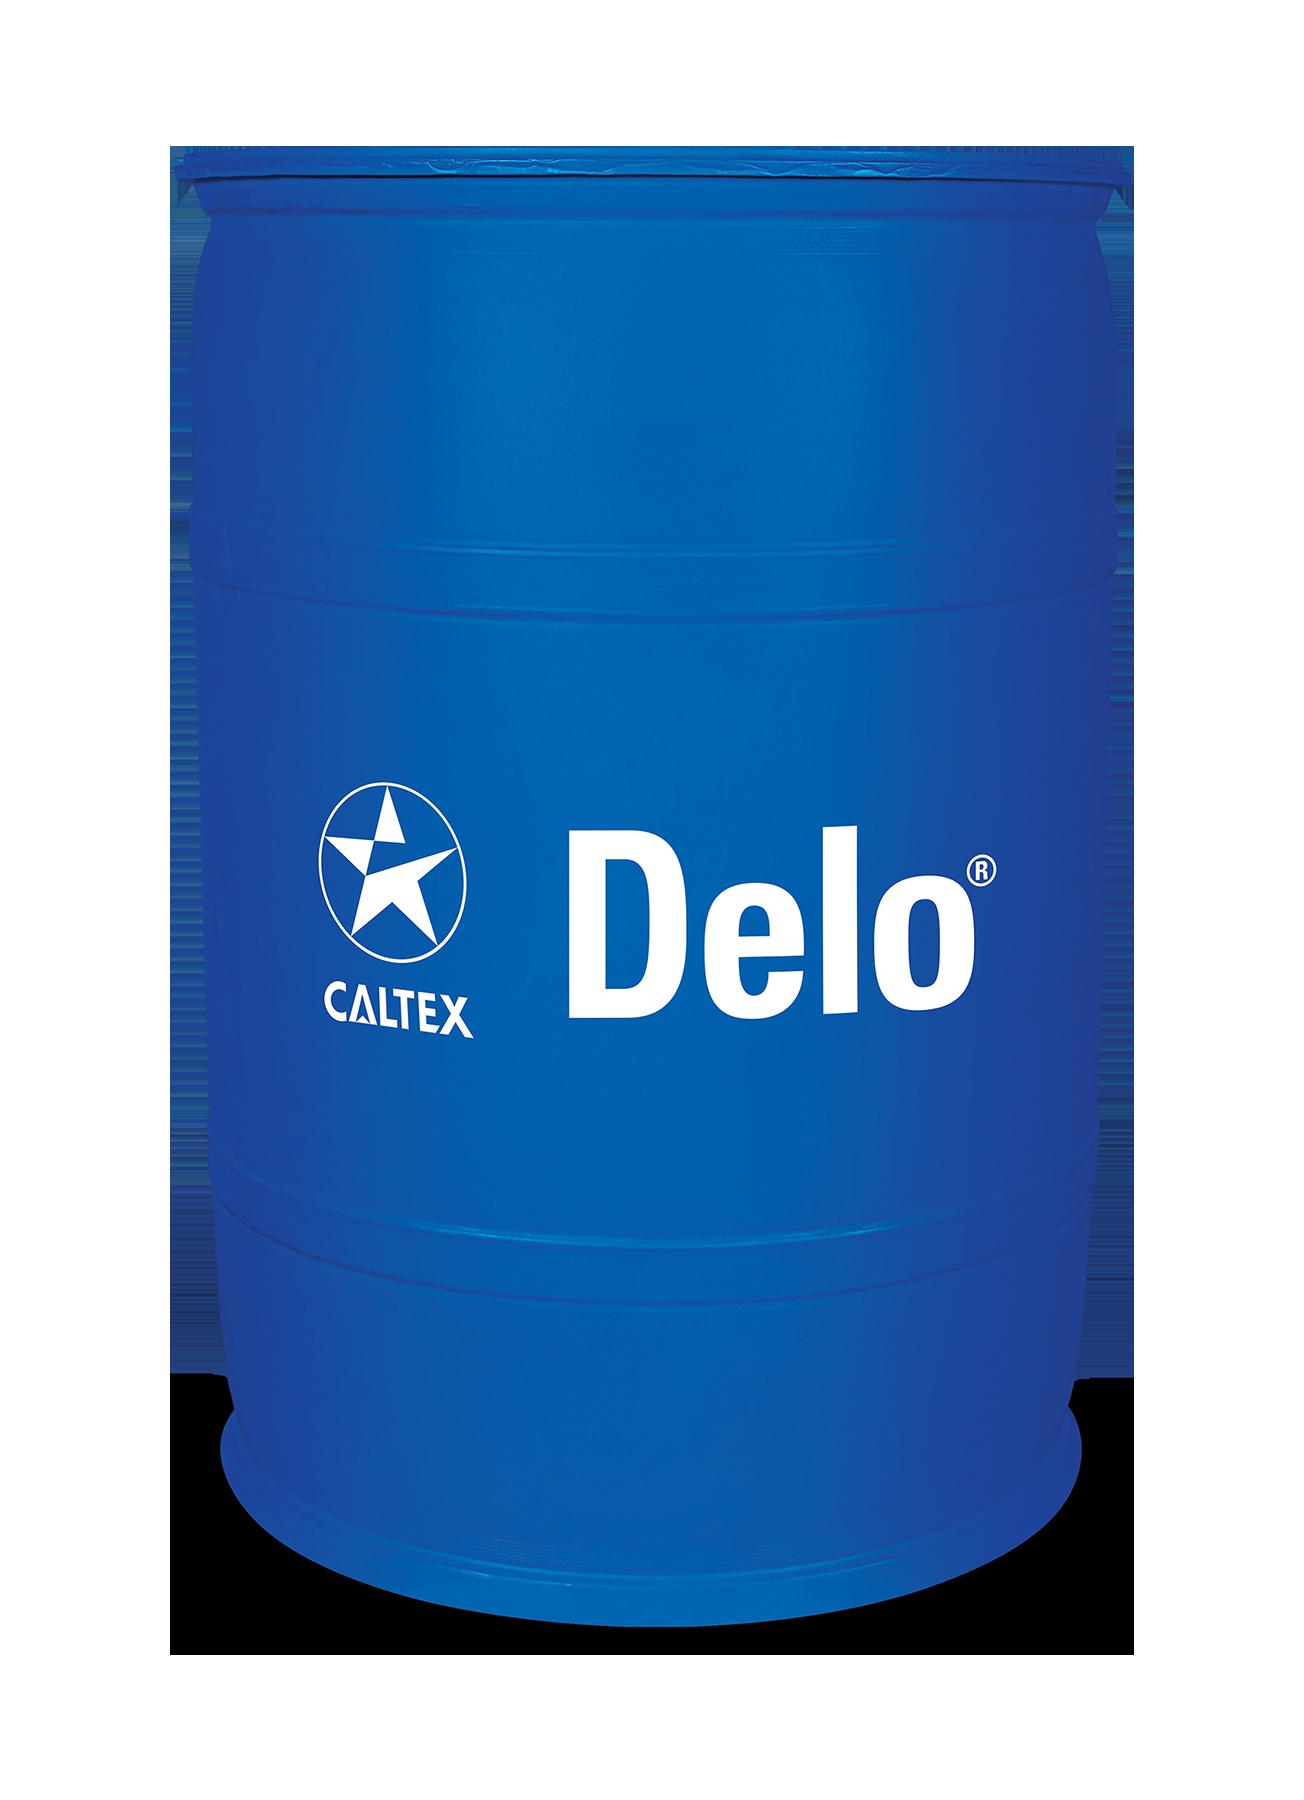 Caltex Delo Coolants/Antifreeze for Businesses | Caltex Pakistan